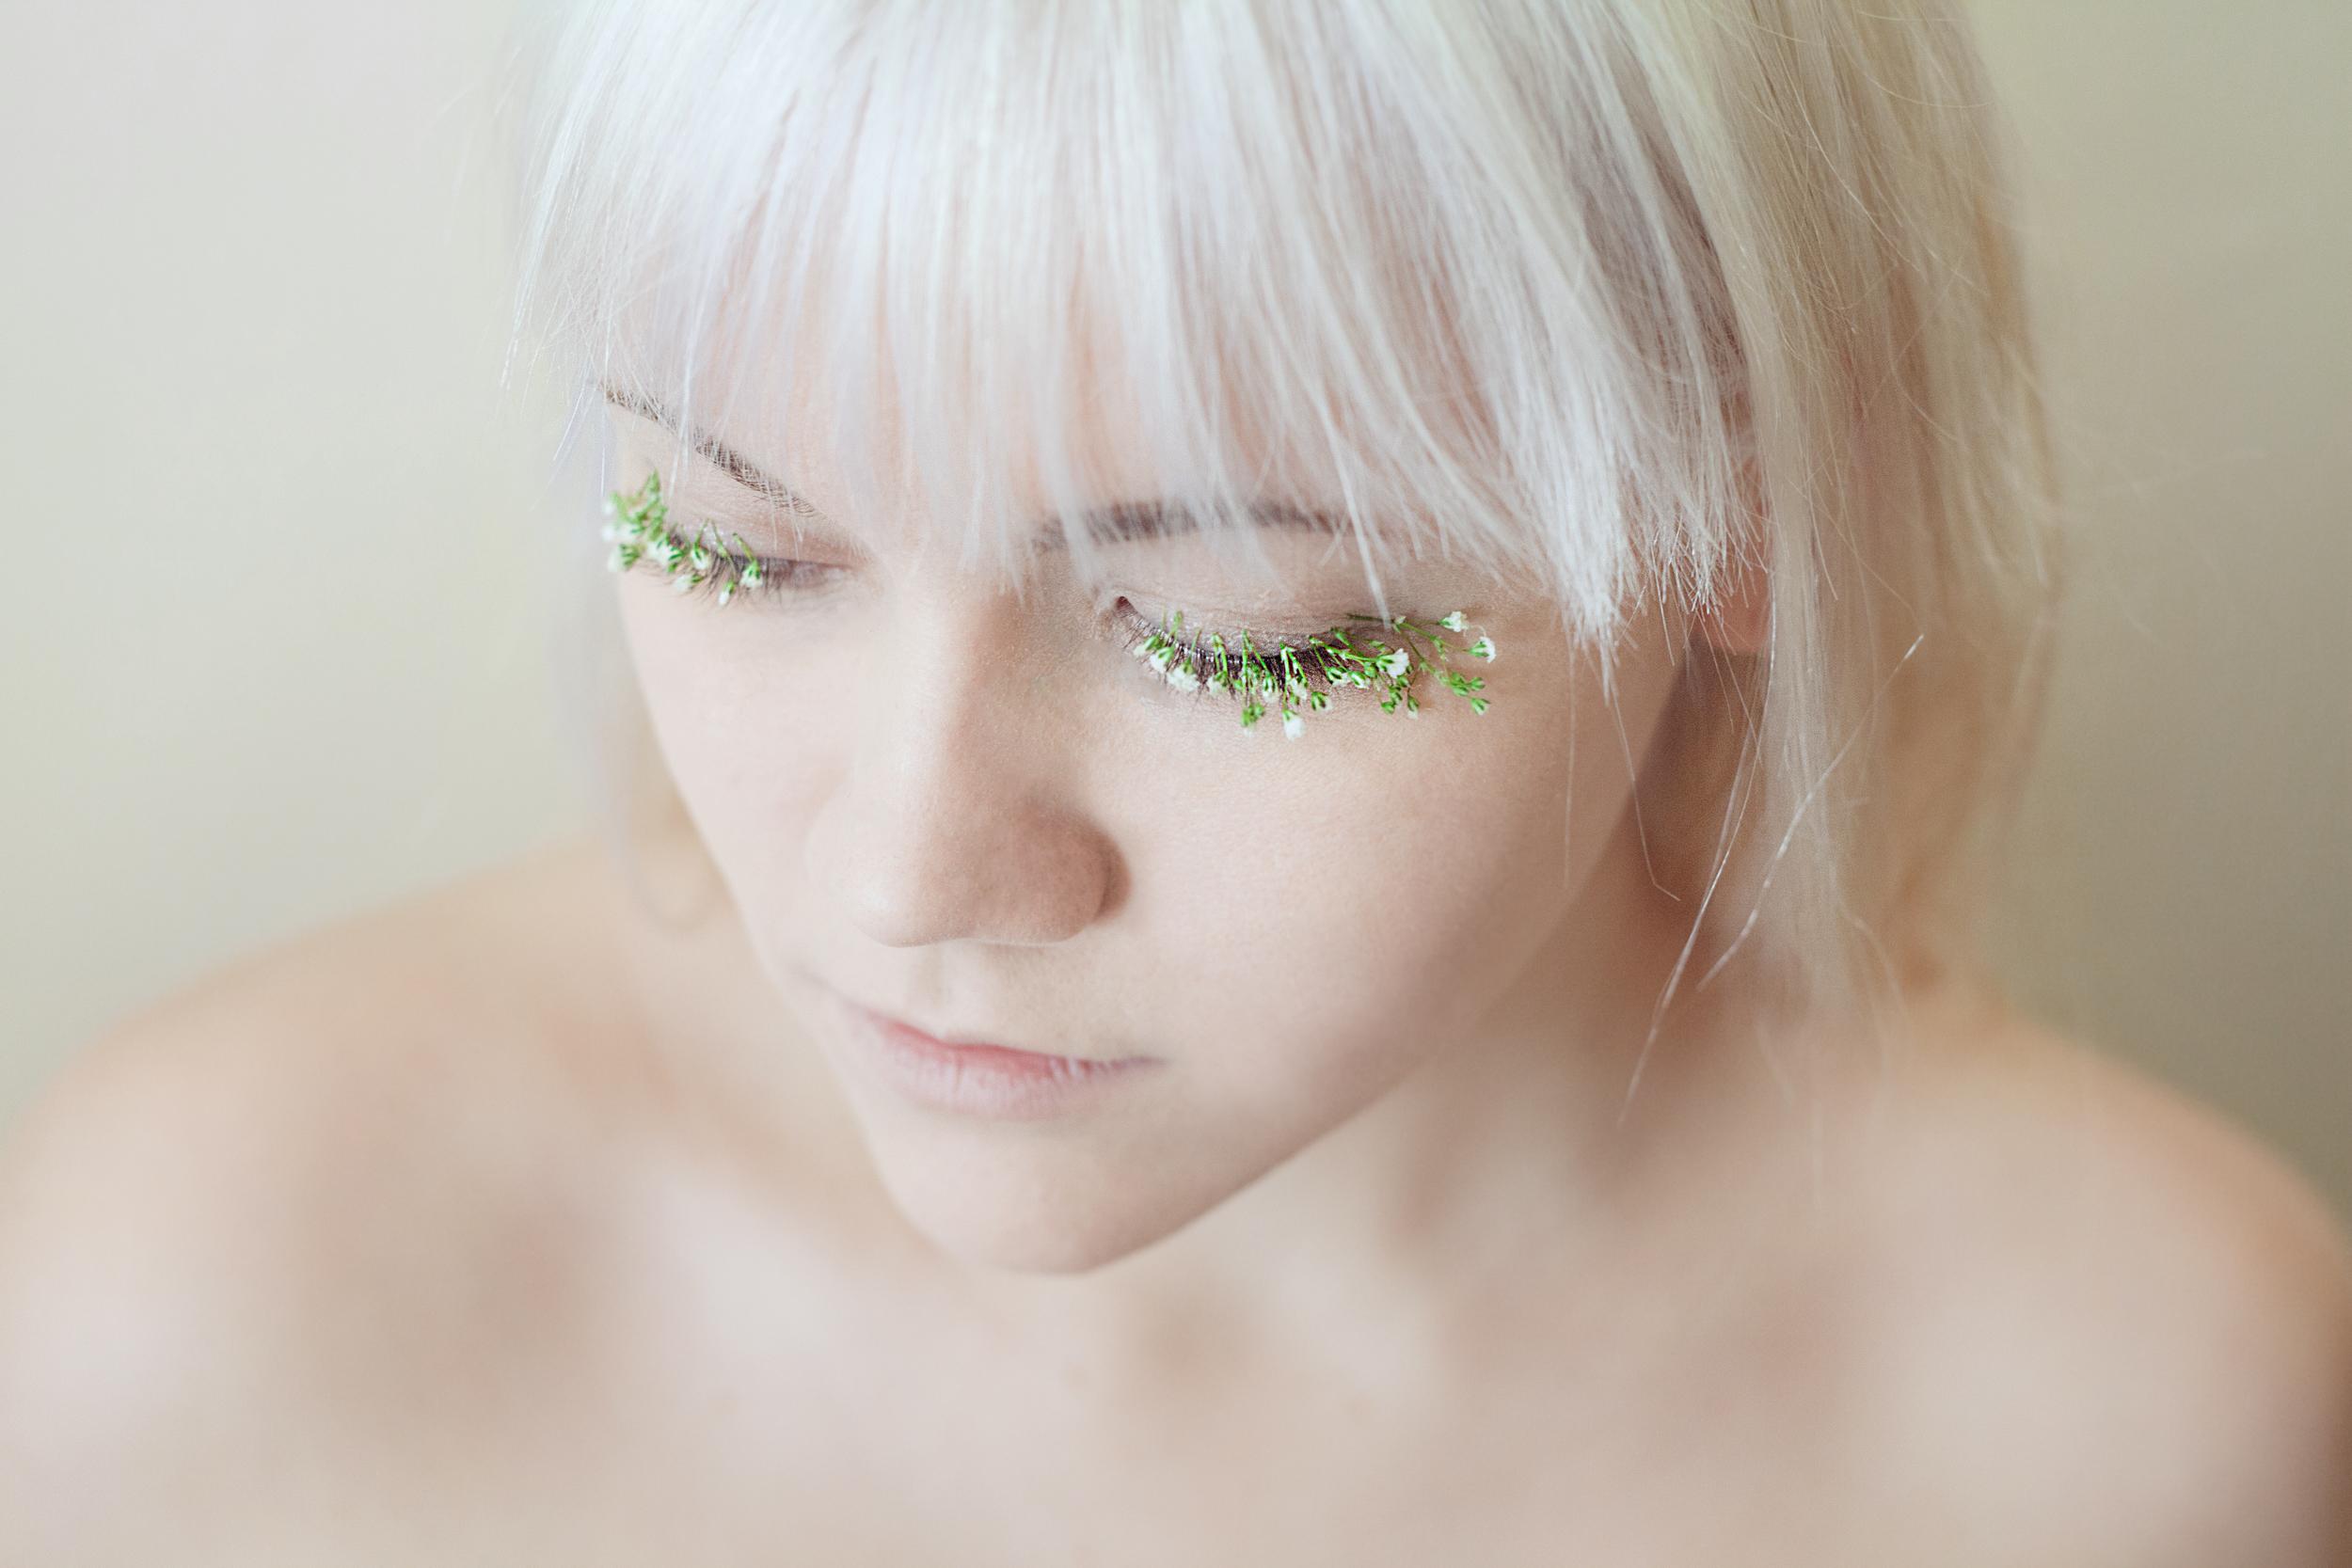 & Emma let me glue flowers to her eyelashes.